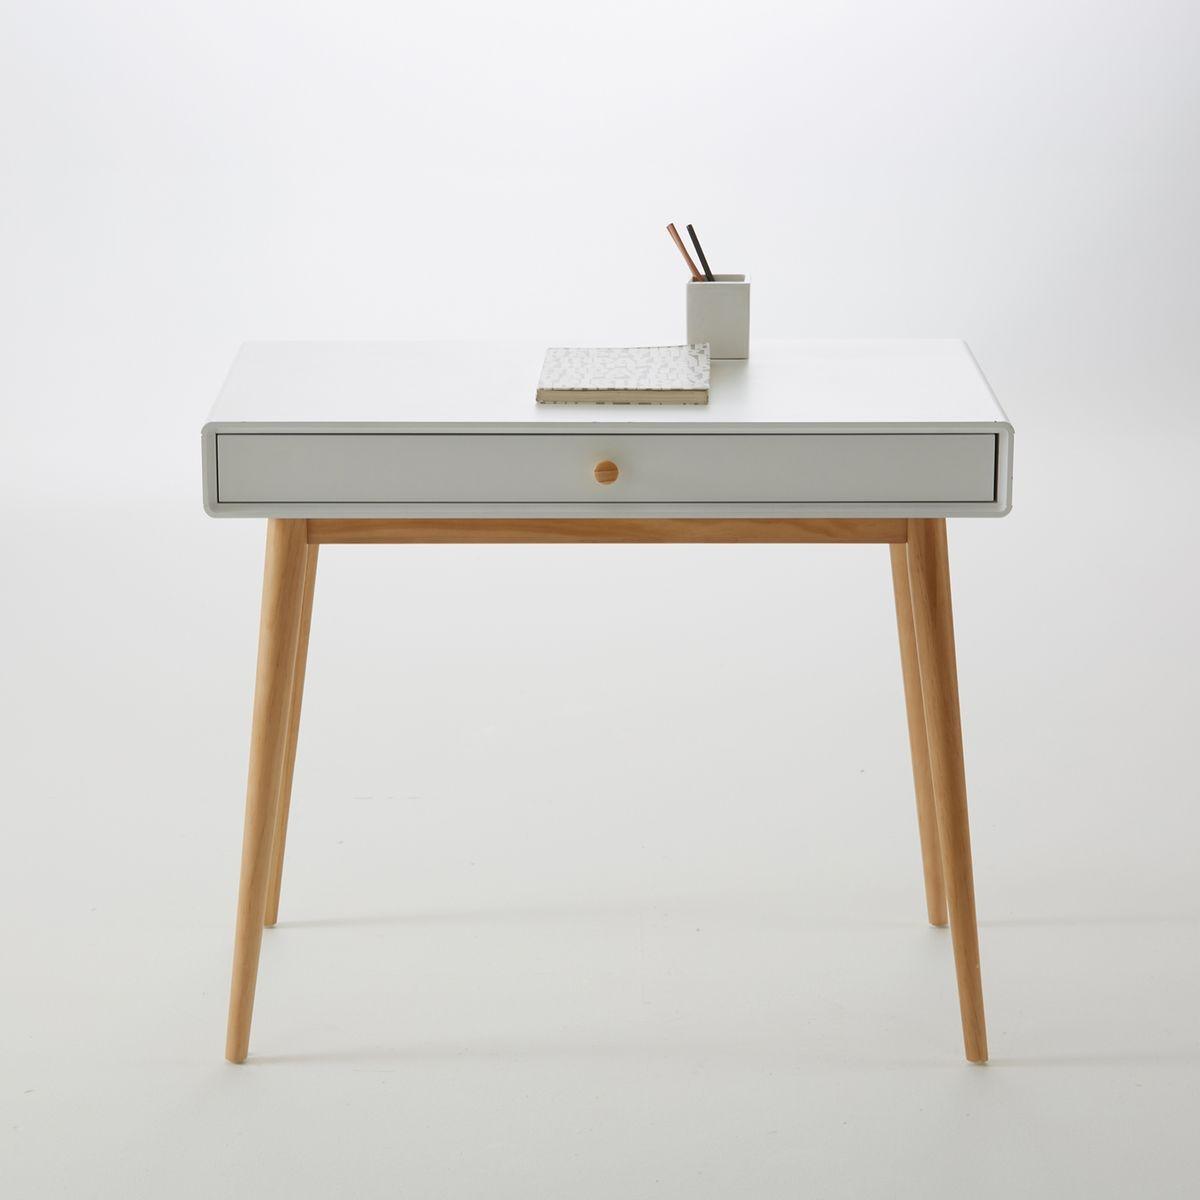 solde la redoute meuble maison design. Black Bedroom Furniture Sets. Home Design Ideas